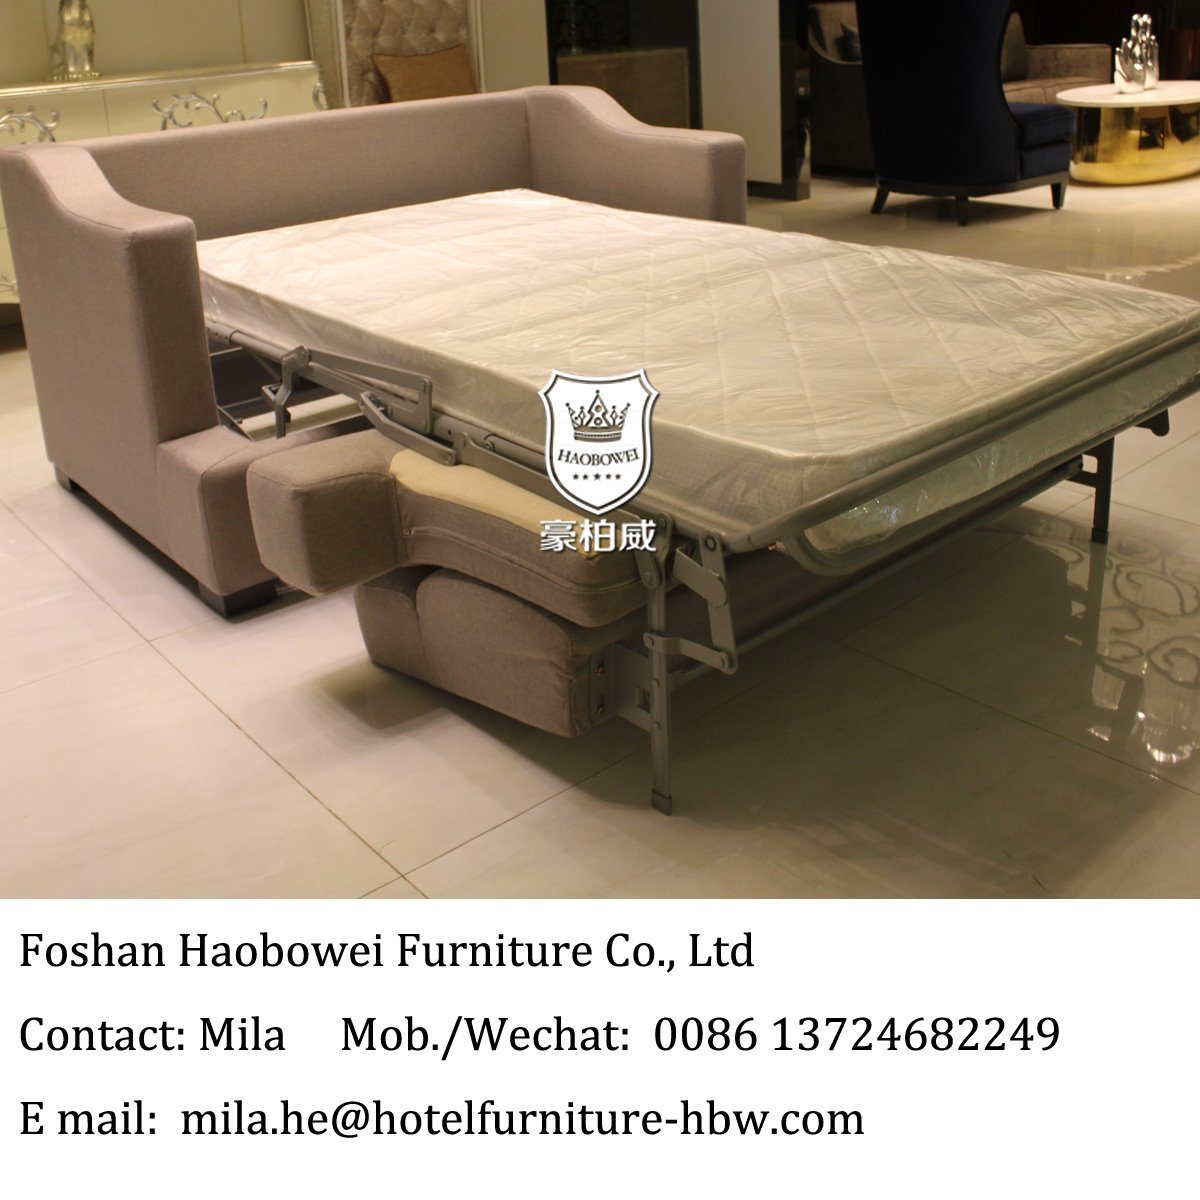 Pleasant Hot Item Uk Hilton Hotel Sofa Sleeper For Guest Room Hotel Quality Sofa Bed Supplier Machost Co Dining Chair Design Ideas Machostcouk